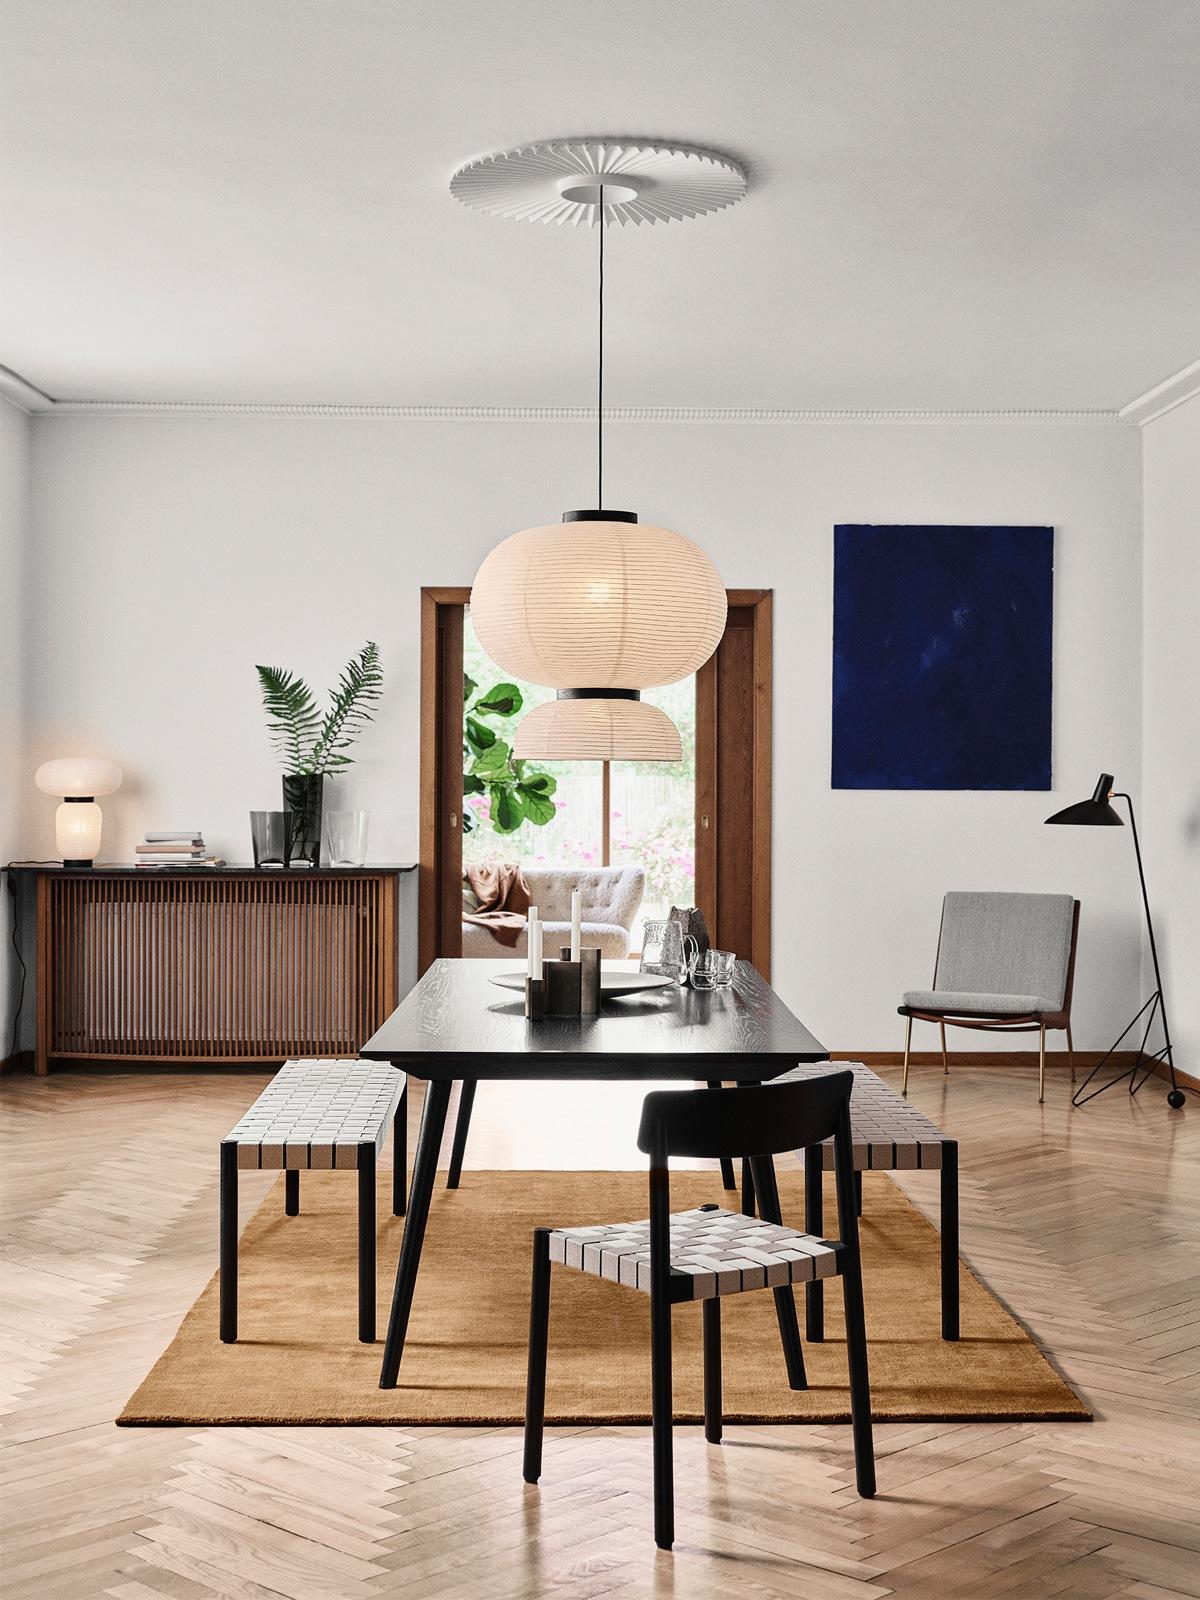 &tradition Formakami JH5 DesignOrt Onlineshop Lampen Berlin